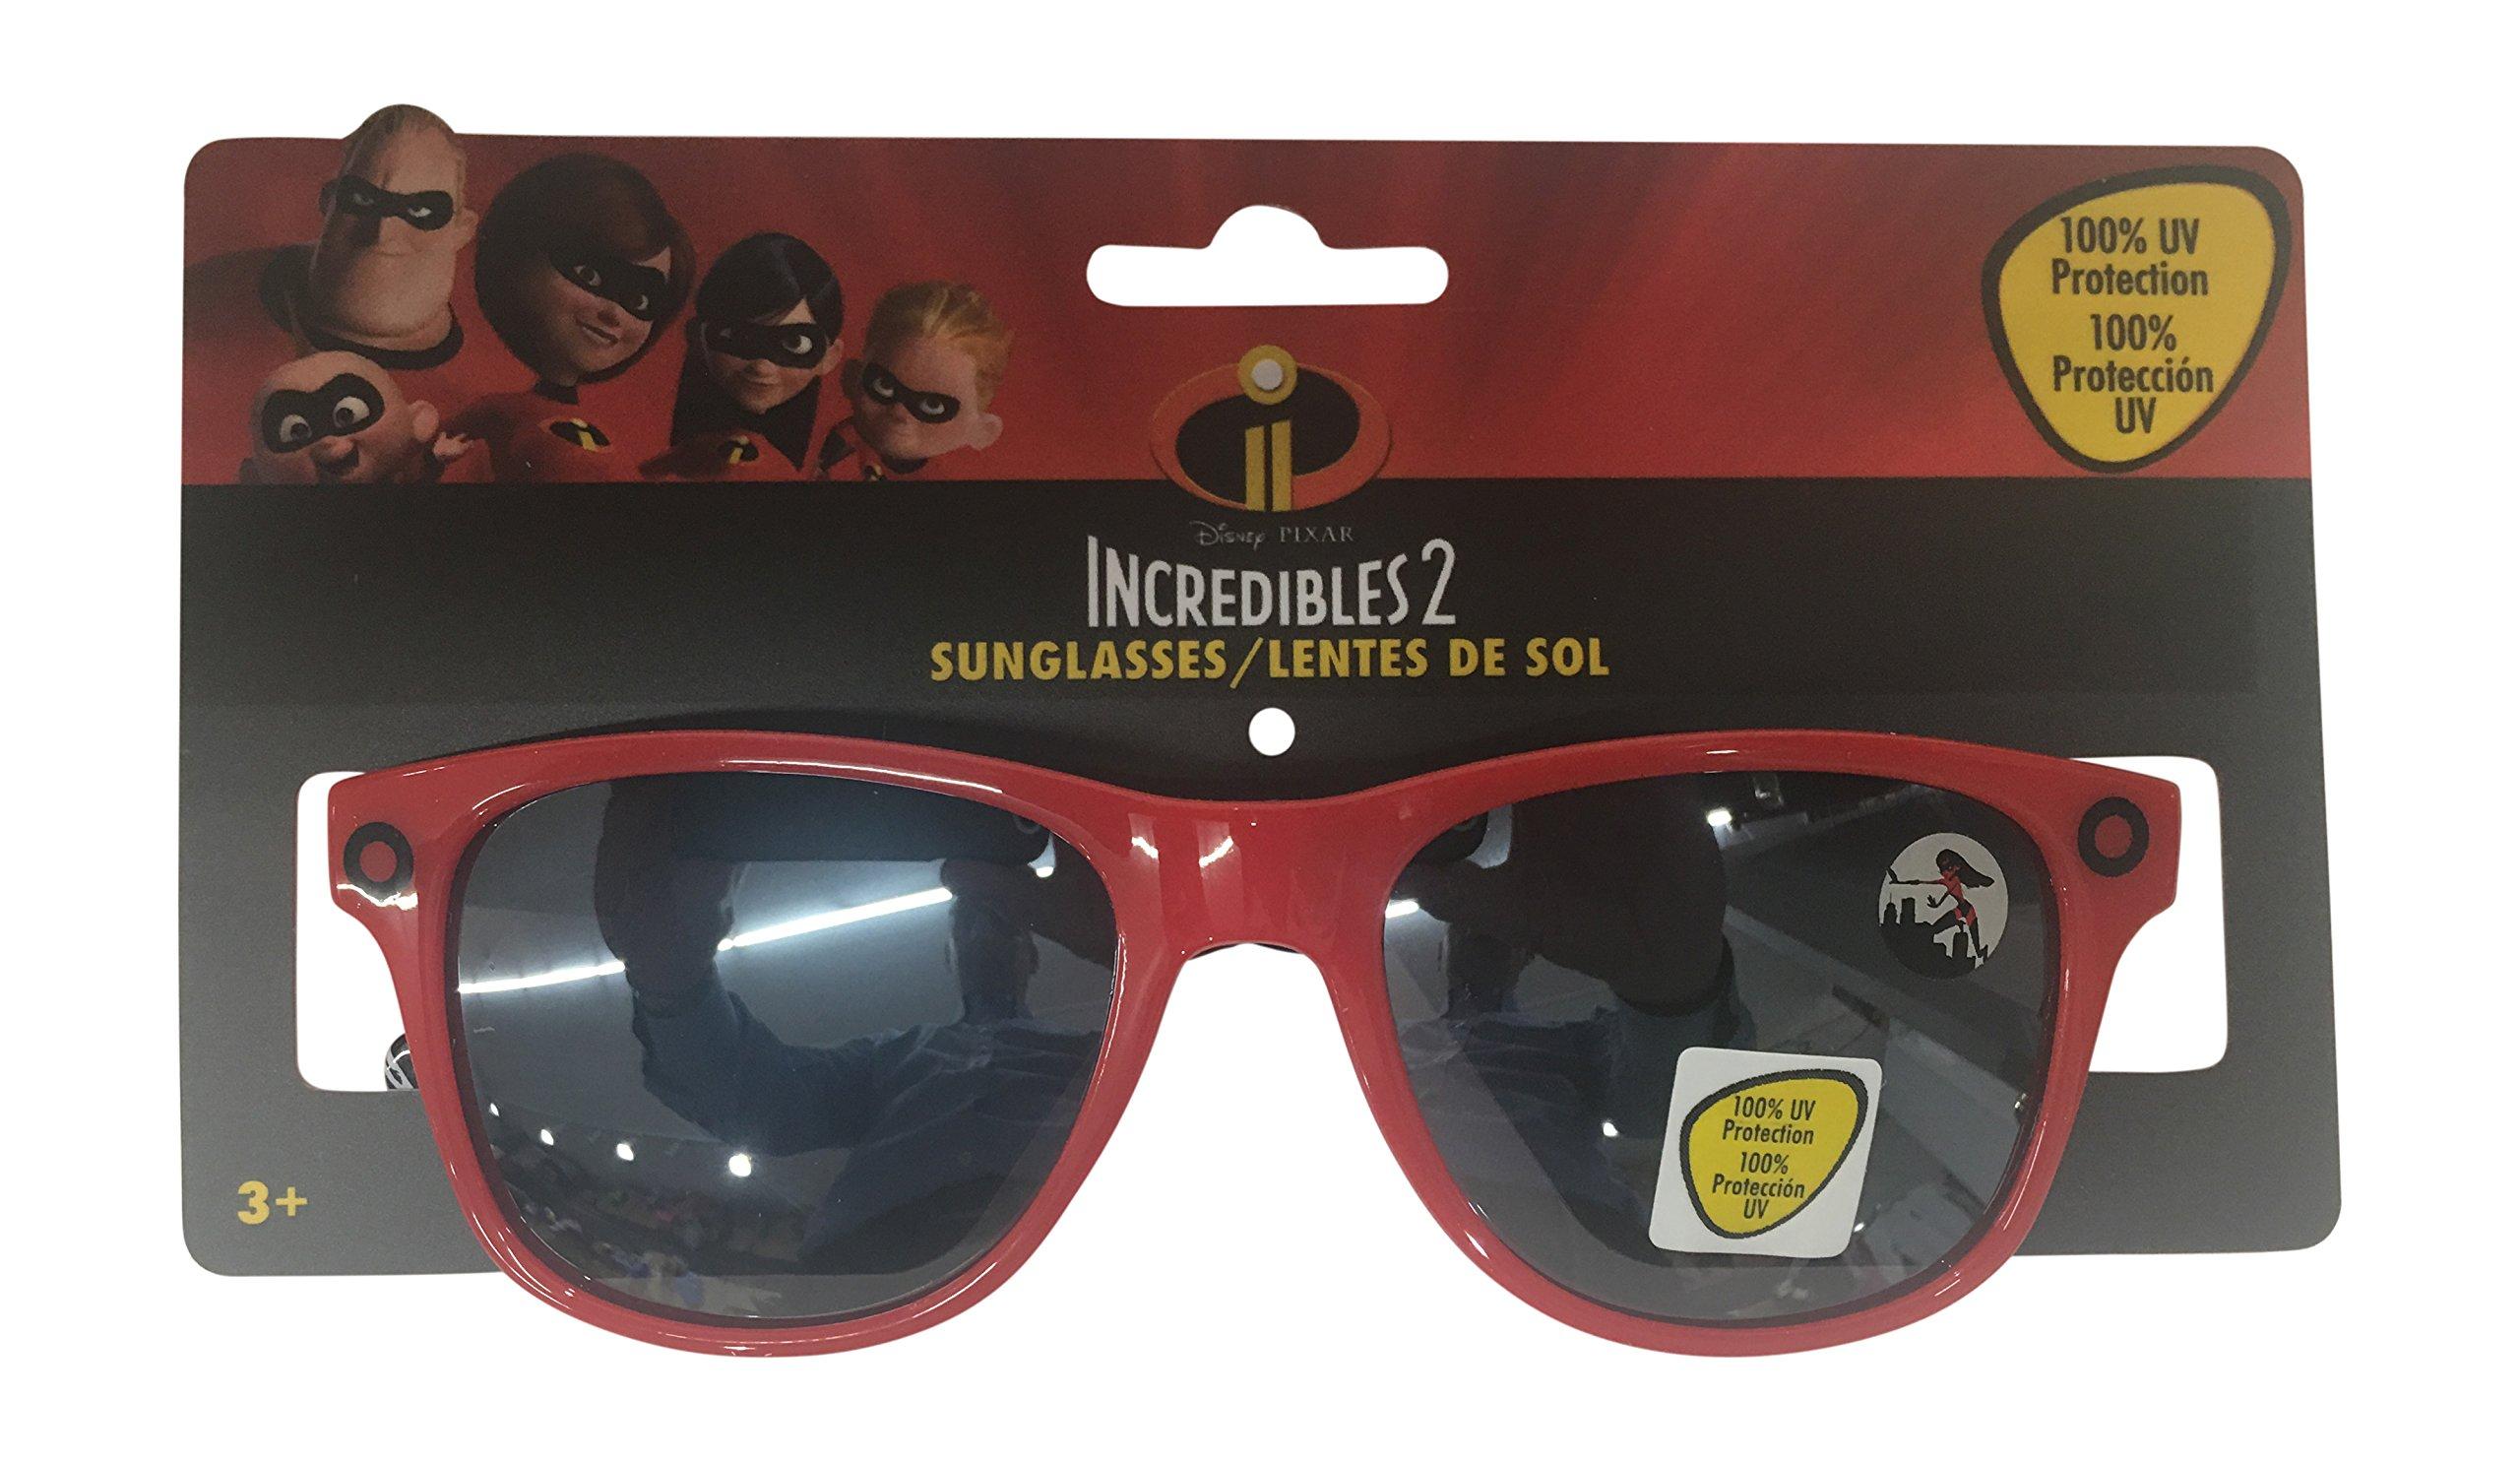 Pan Oceanic Disney The Incredibles 2 Boys Sunglasses - 100% UVA & UVB Protection